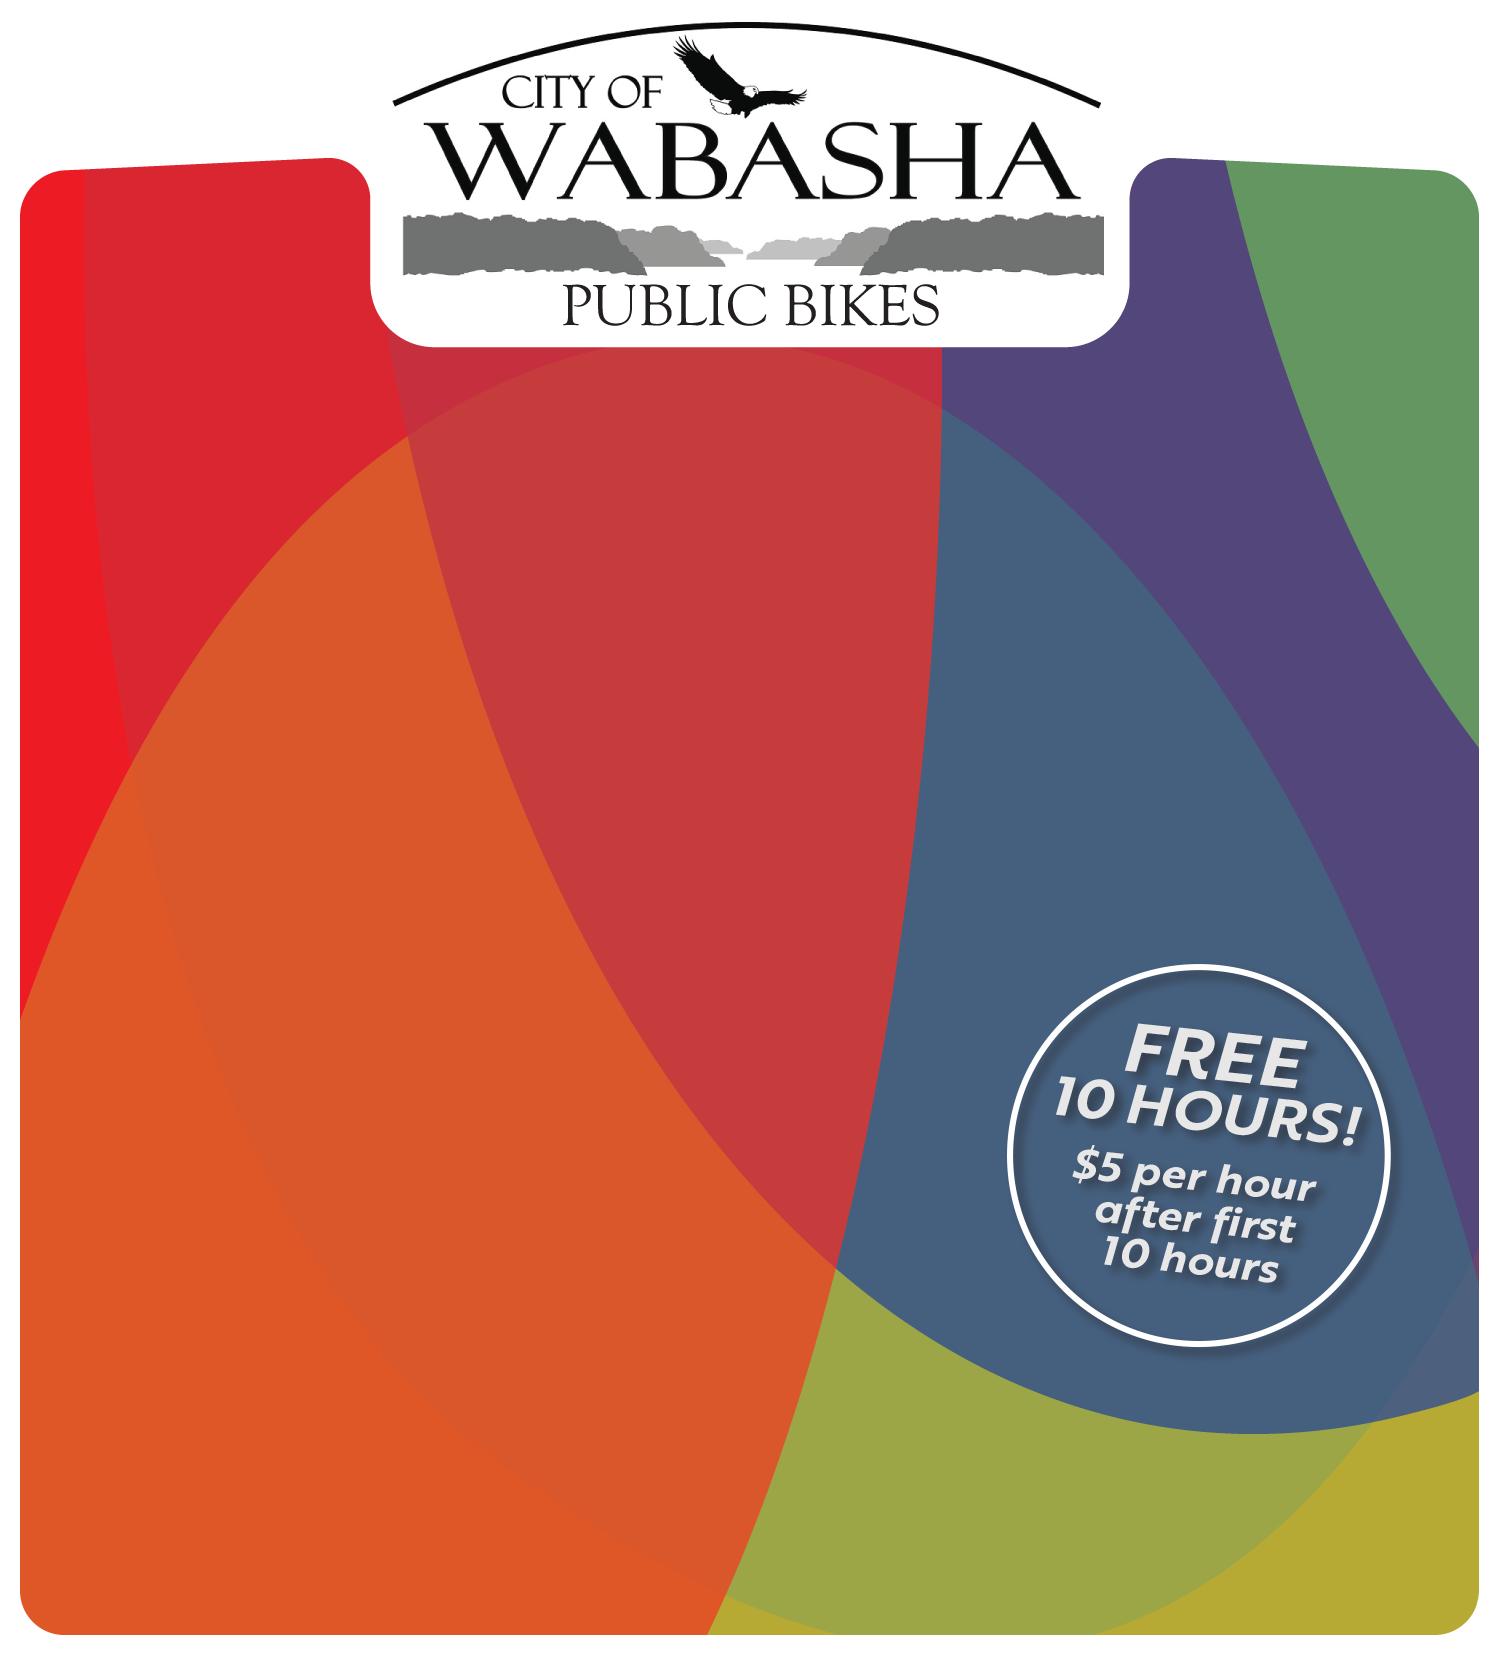 May 2019 - Wabasha's NEW Public Bikes kick-off on June 14, 5-7 pm!